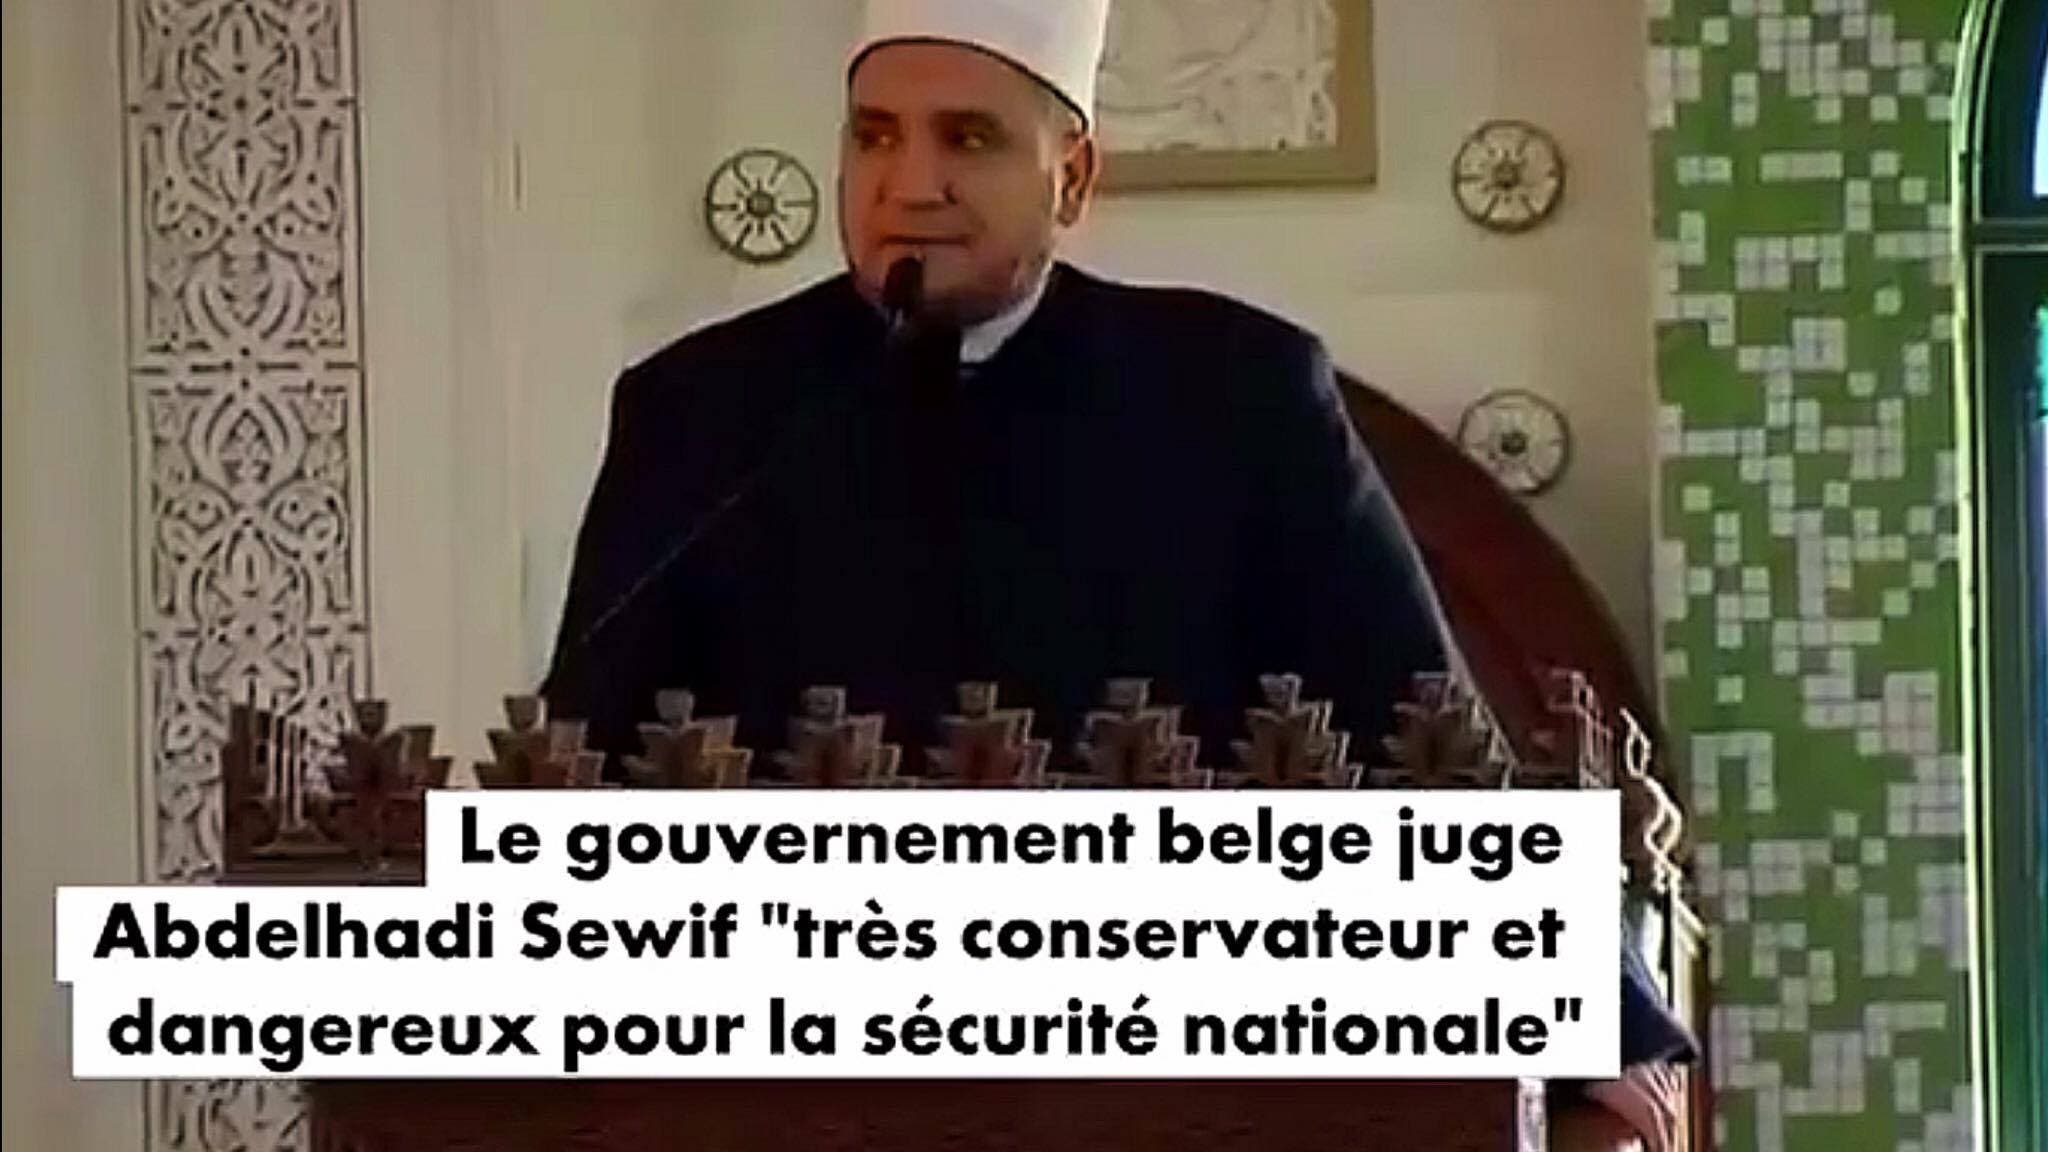 Abdelhadi-Sewif